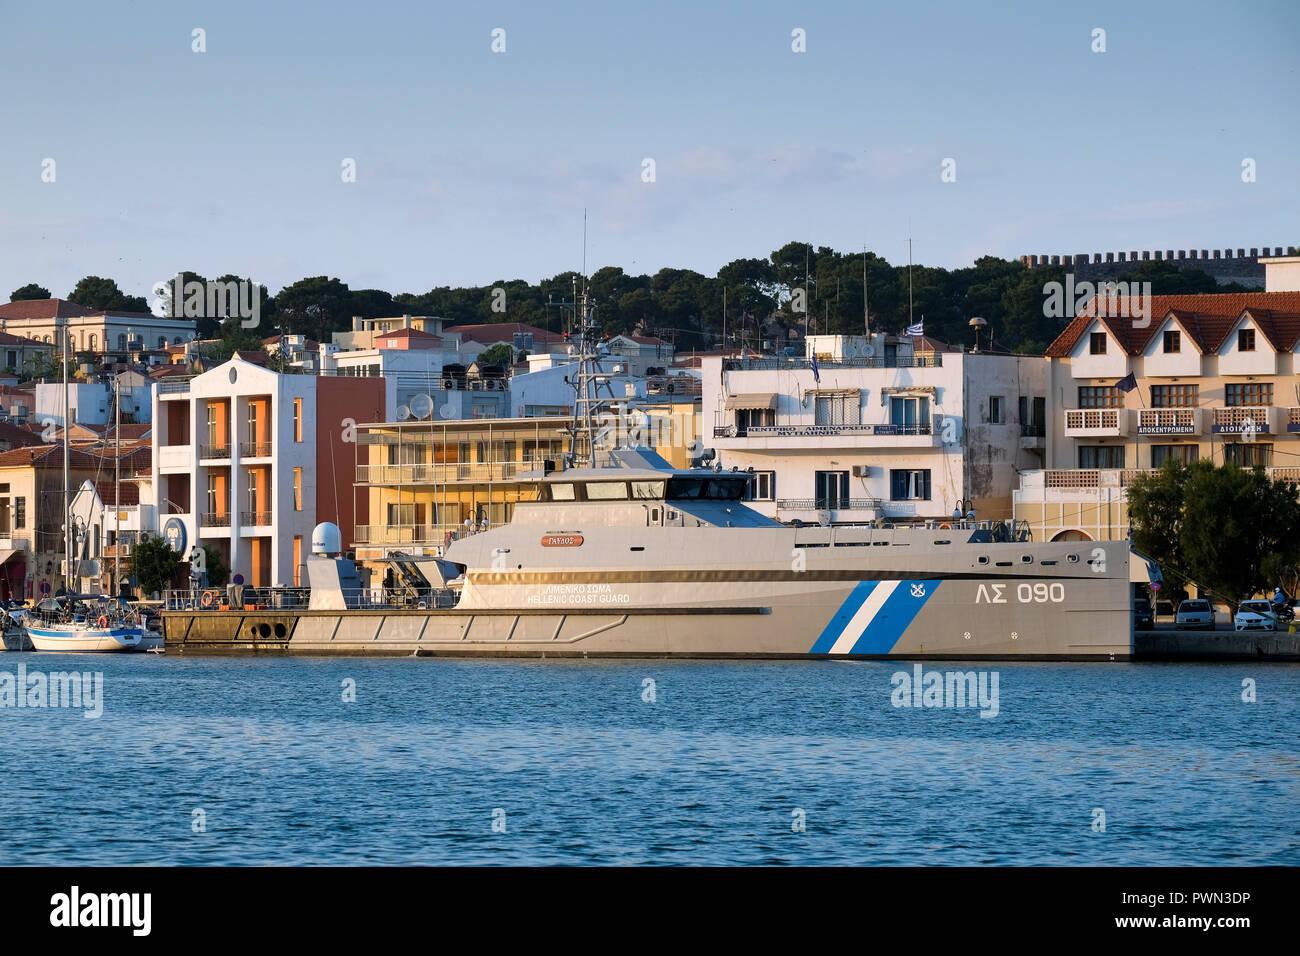 Greek coast guard boat in the port of the island capital Mytilini, Lesbos Island, Greece, May 2018 - Schiff der griechischen Küstenwache im Hafen der Inselhauptstadt Mytilini, Insel Lesbos, Griechenland, Mai 2018 - Stock Image